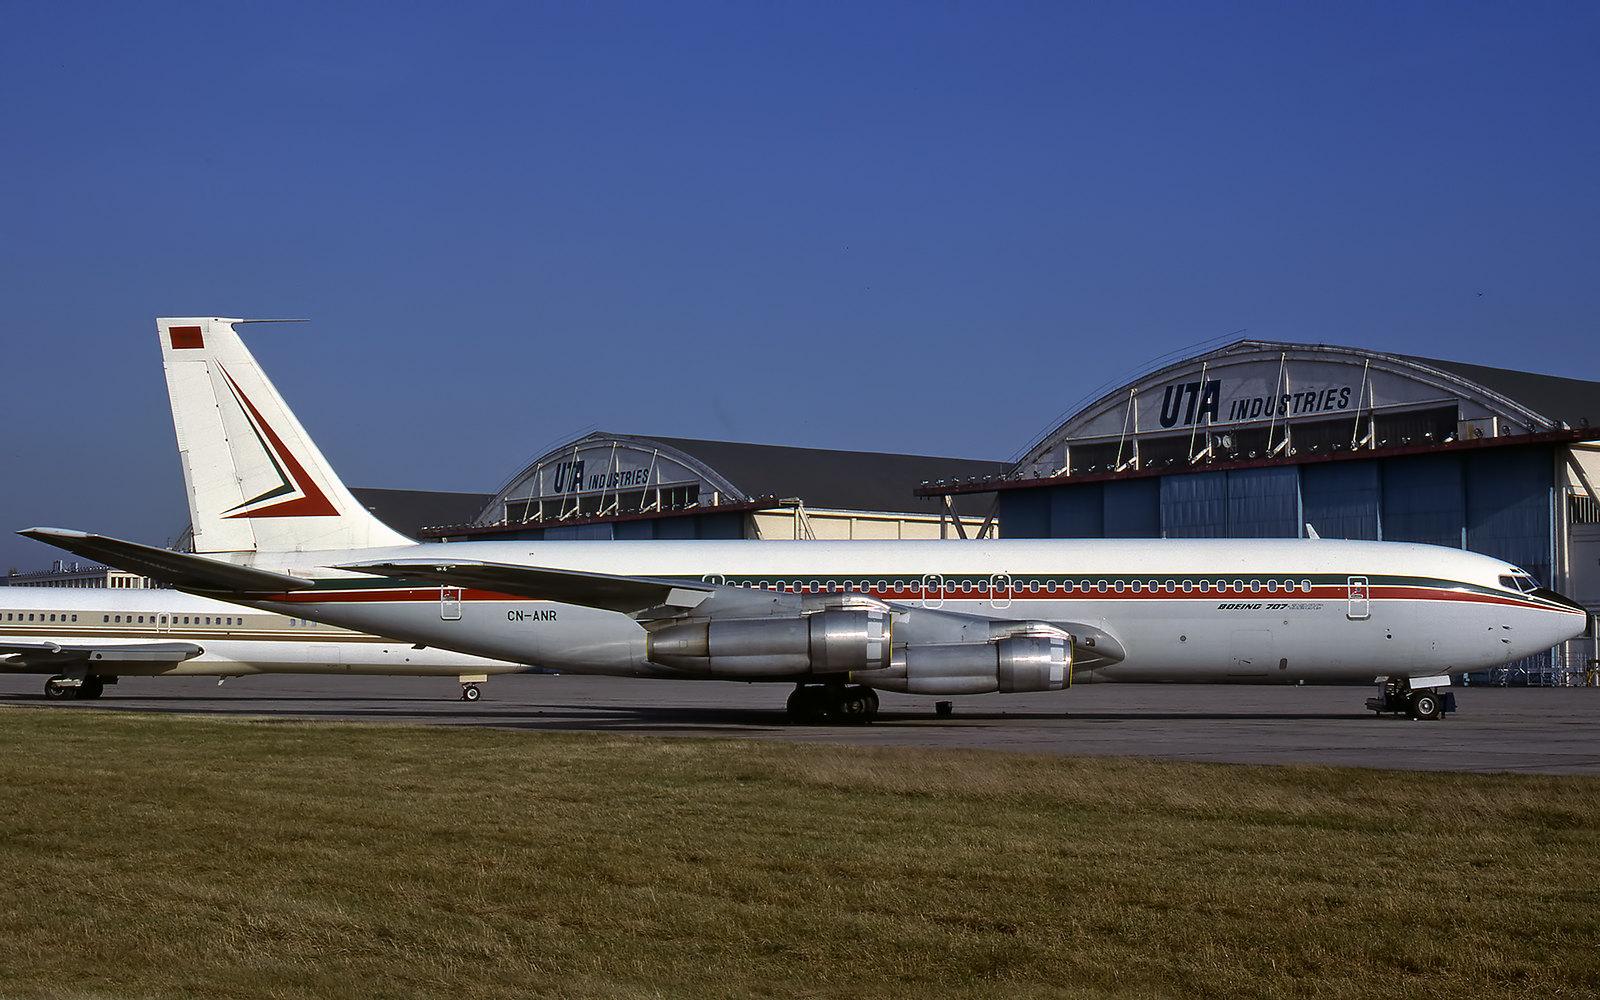 FRA: Photos anciens avions des FRA - Page 12 48315905012_35c08c81ad_h